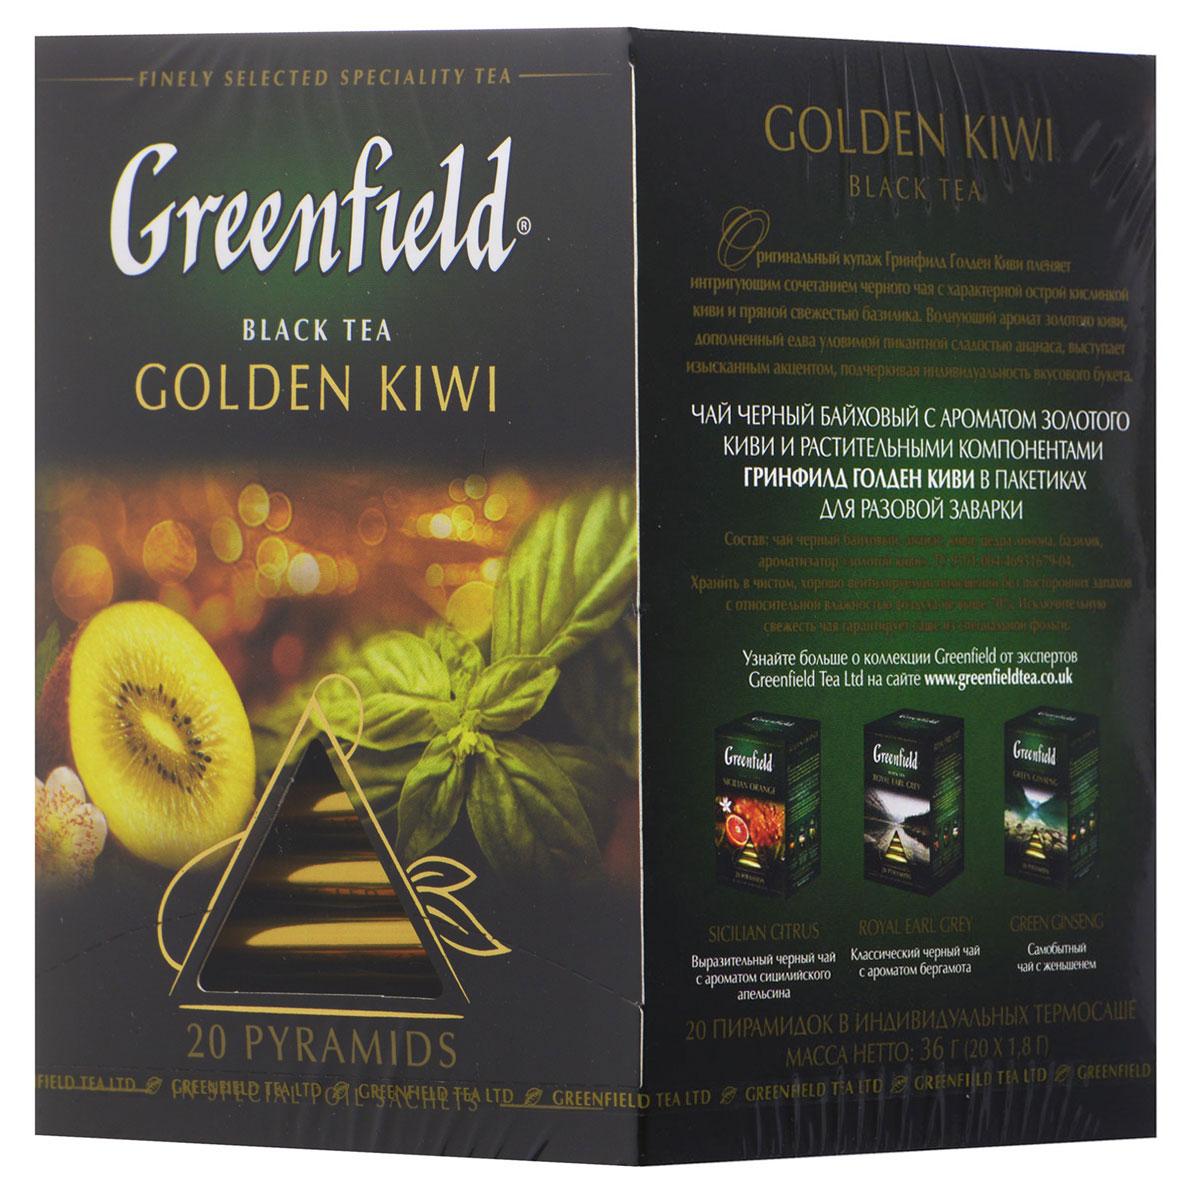 Greenfield Golden Kiwi черный чай в пирамидках, 20 шт greenfield milky oolong чай улун в пирамидках 20 шт